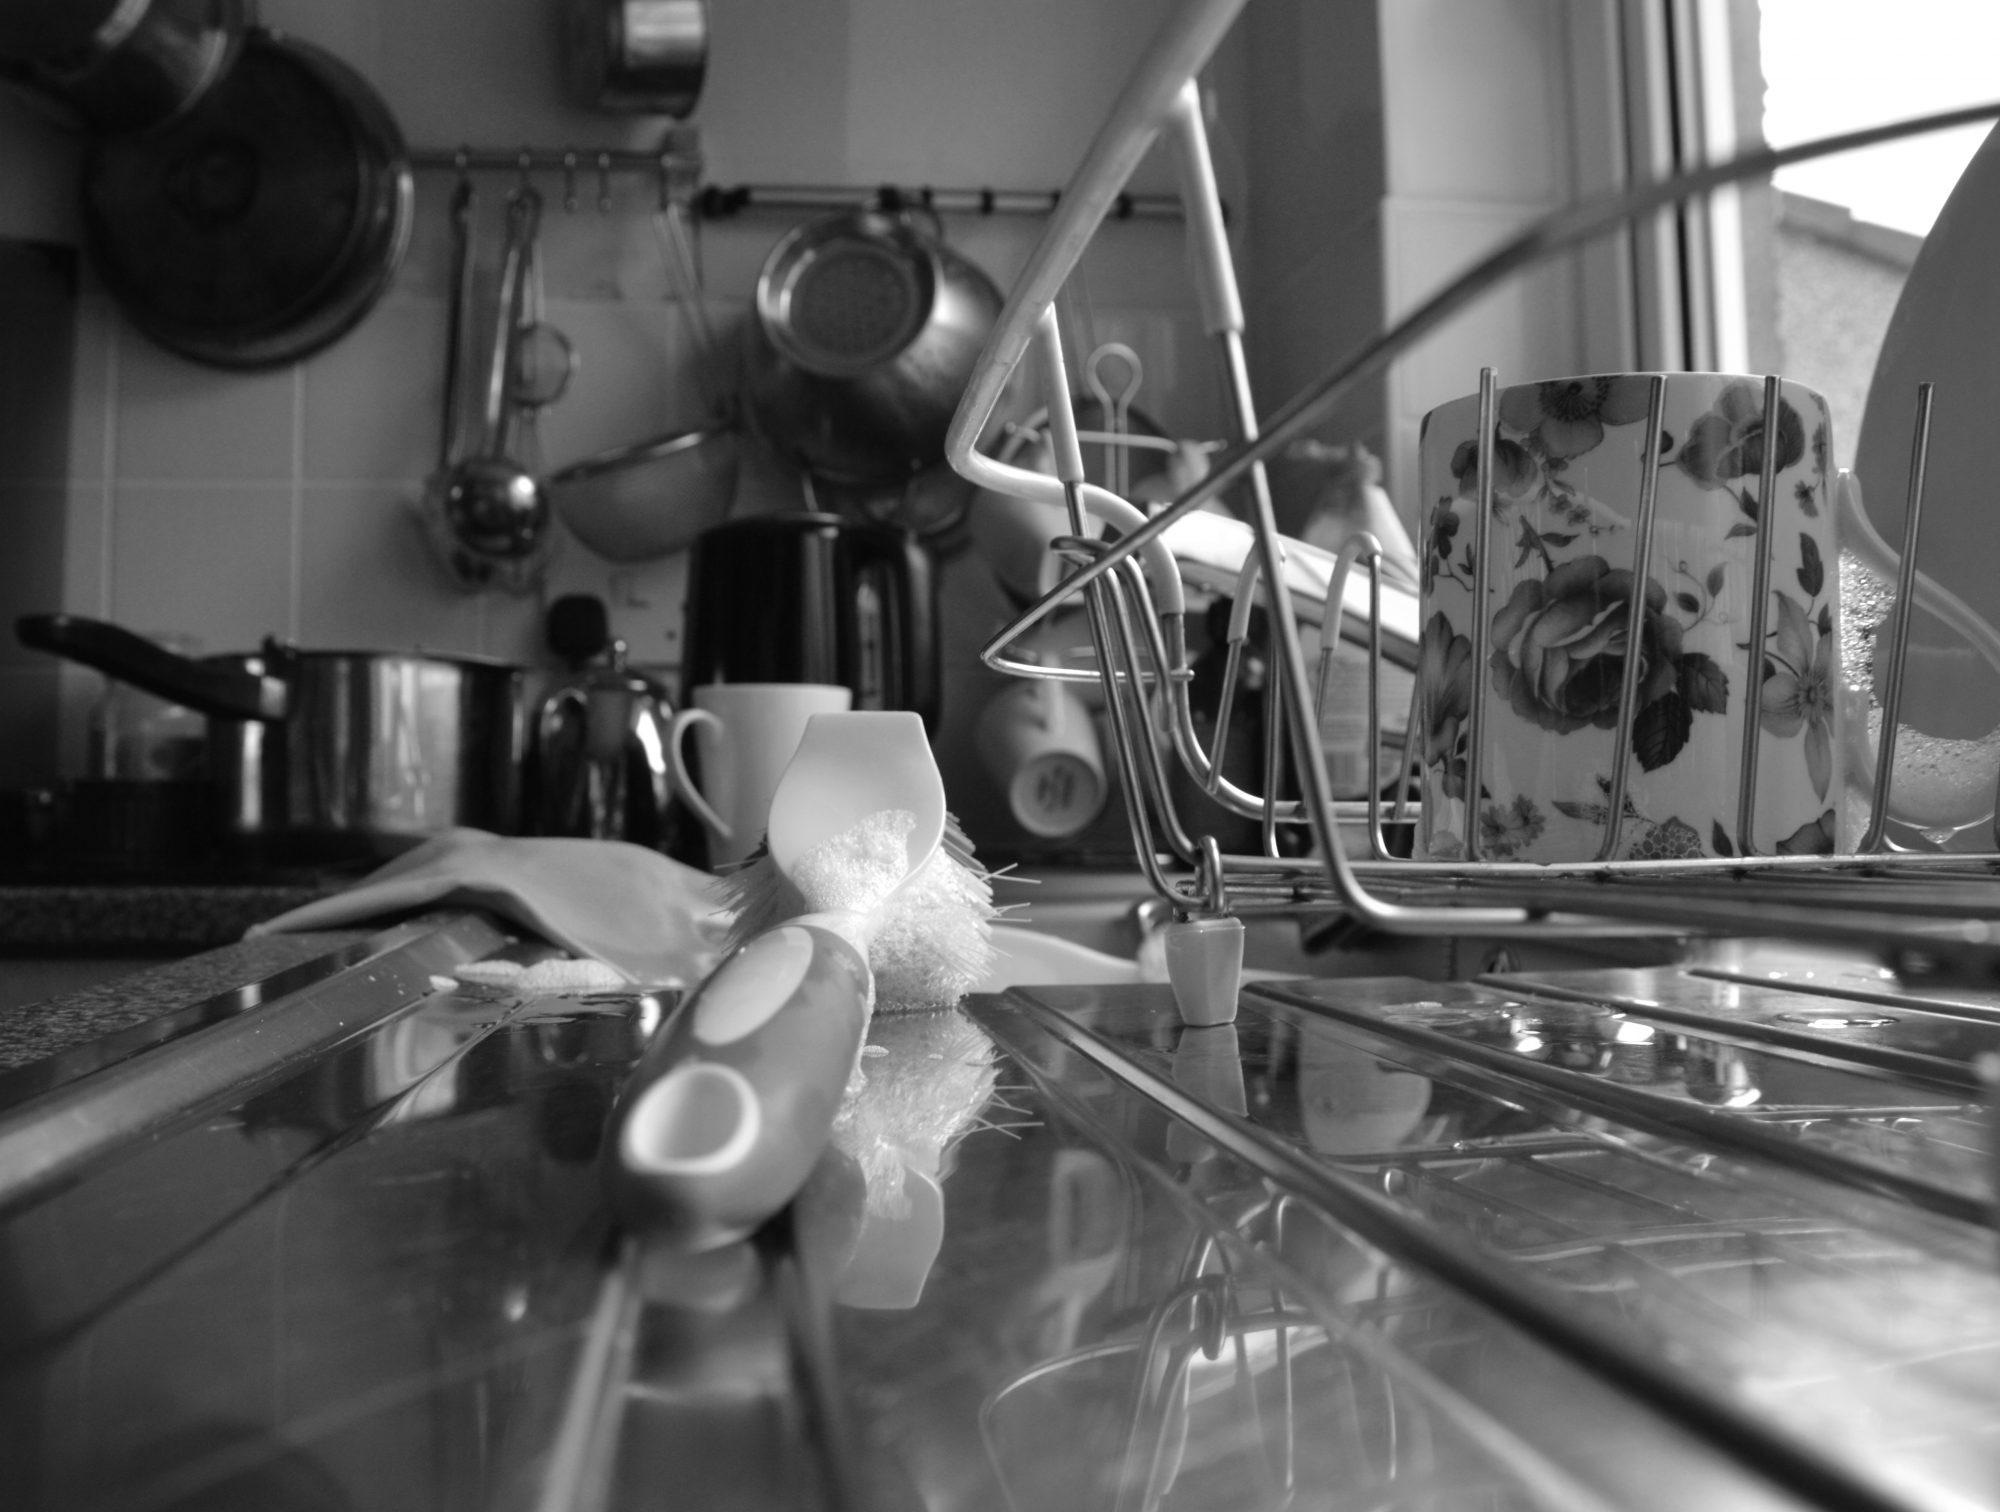 getty-messy-kitchen-image